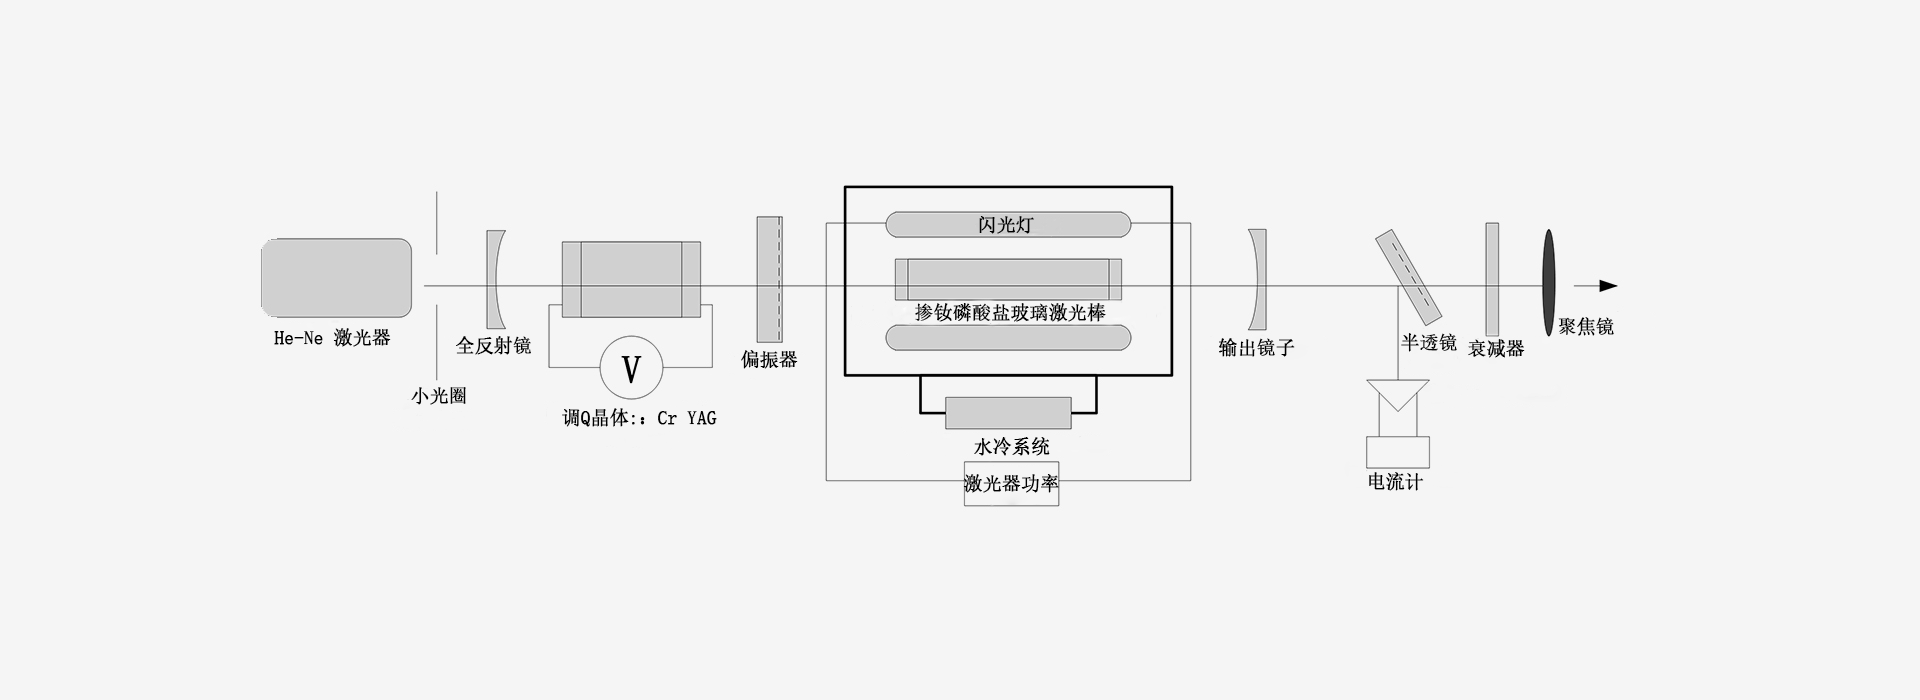 1064nm laser(Nd Glass )-激光器原理图-南京光宝-CRYLINK